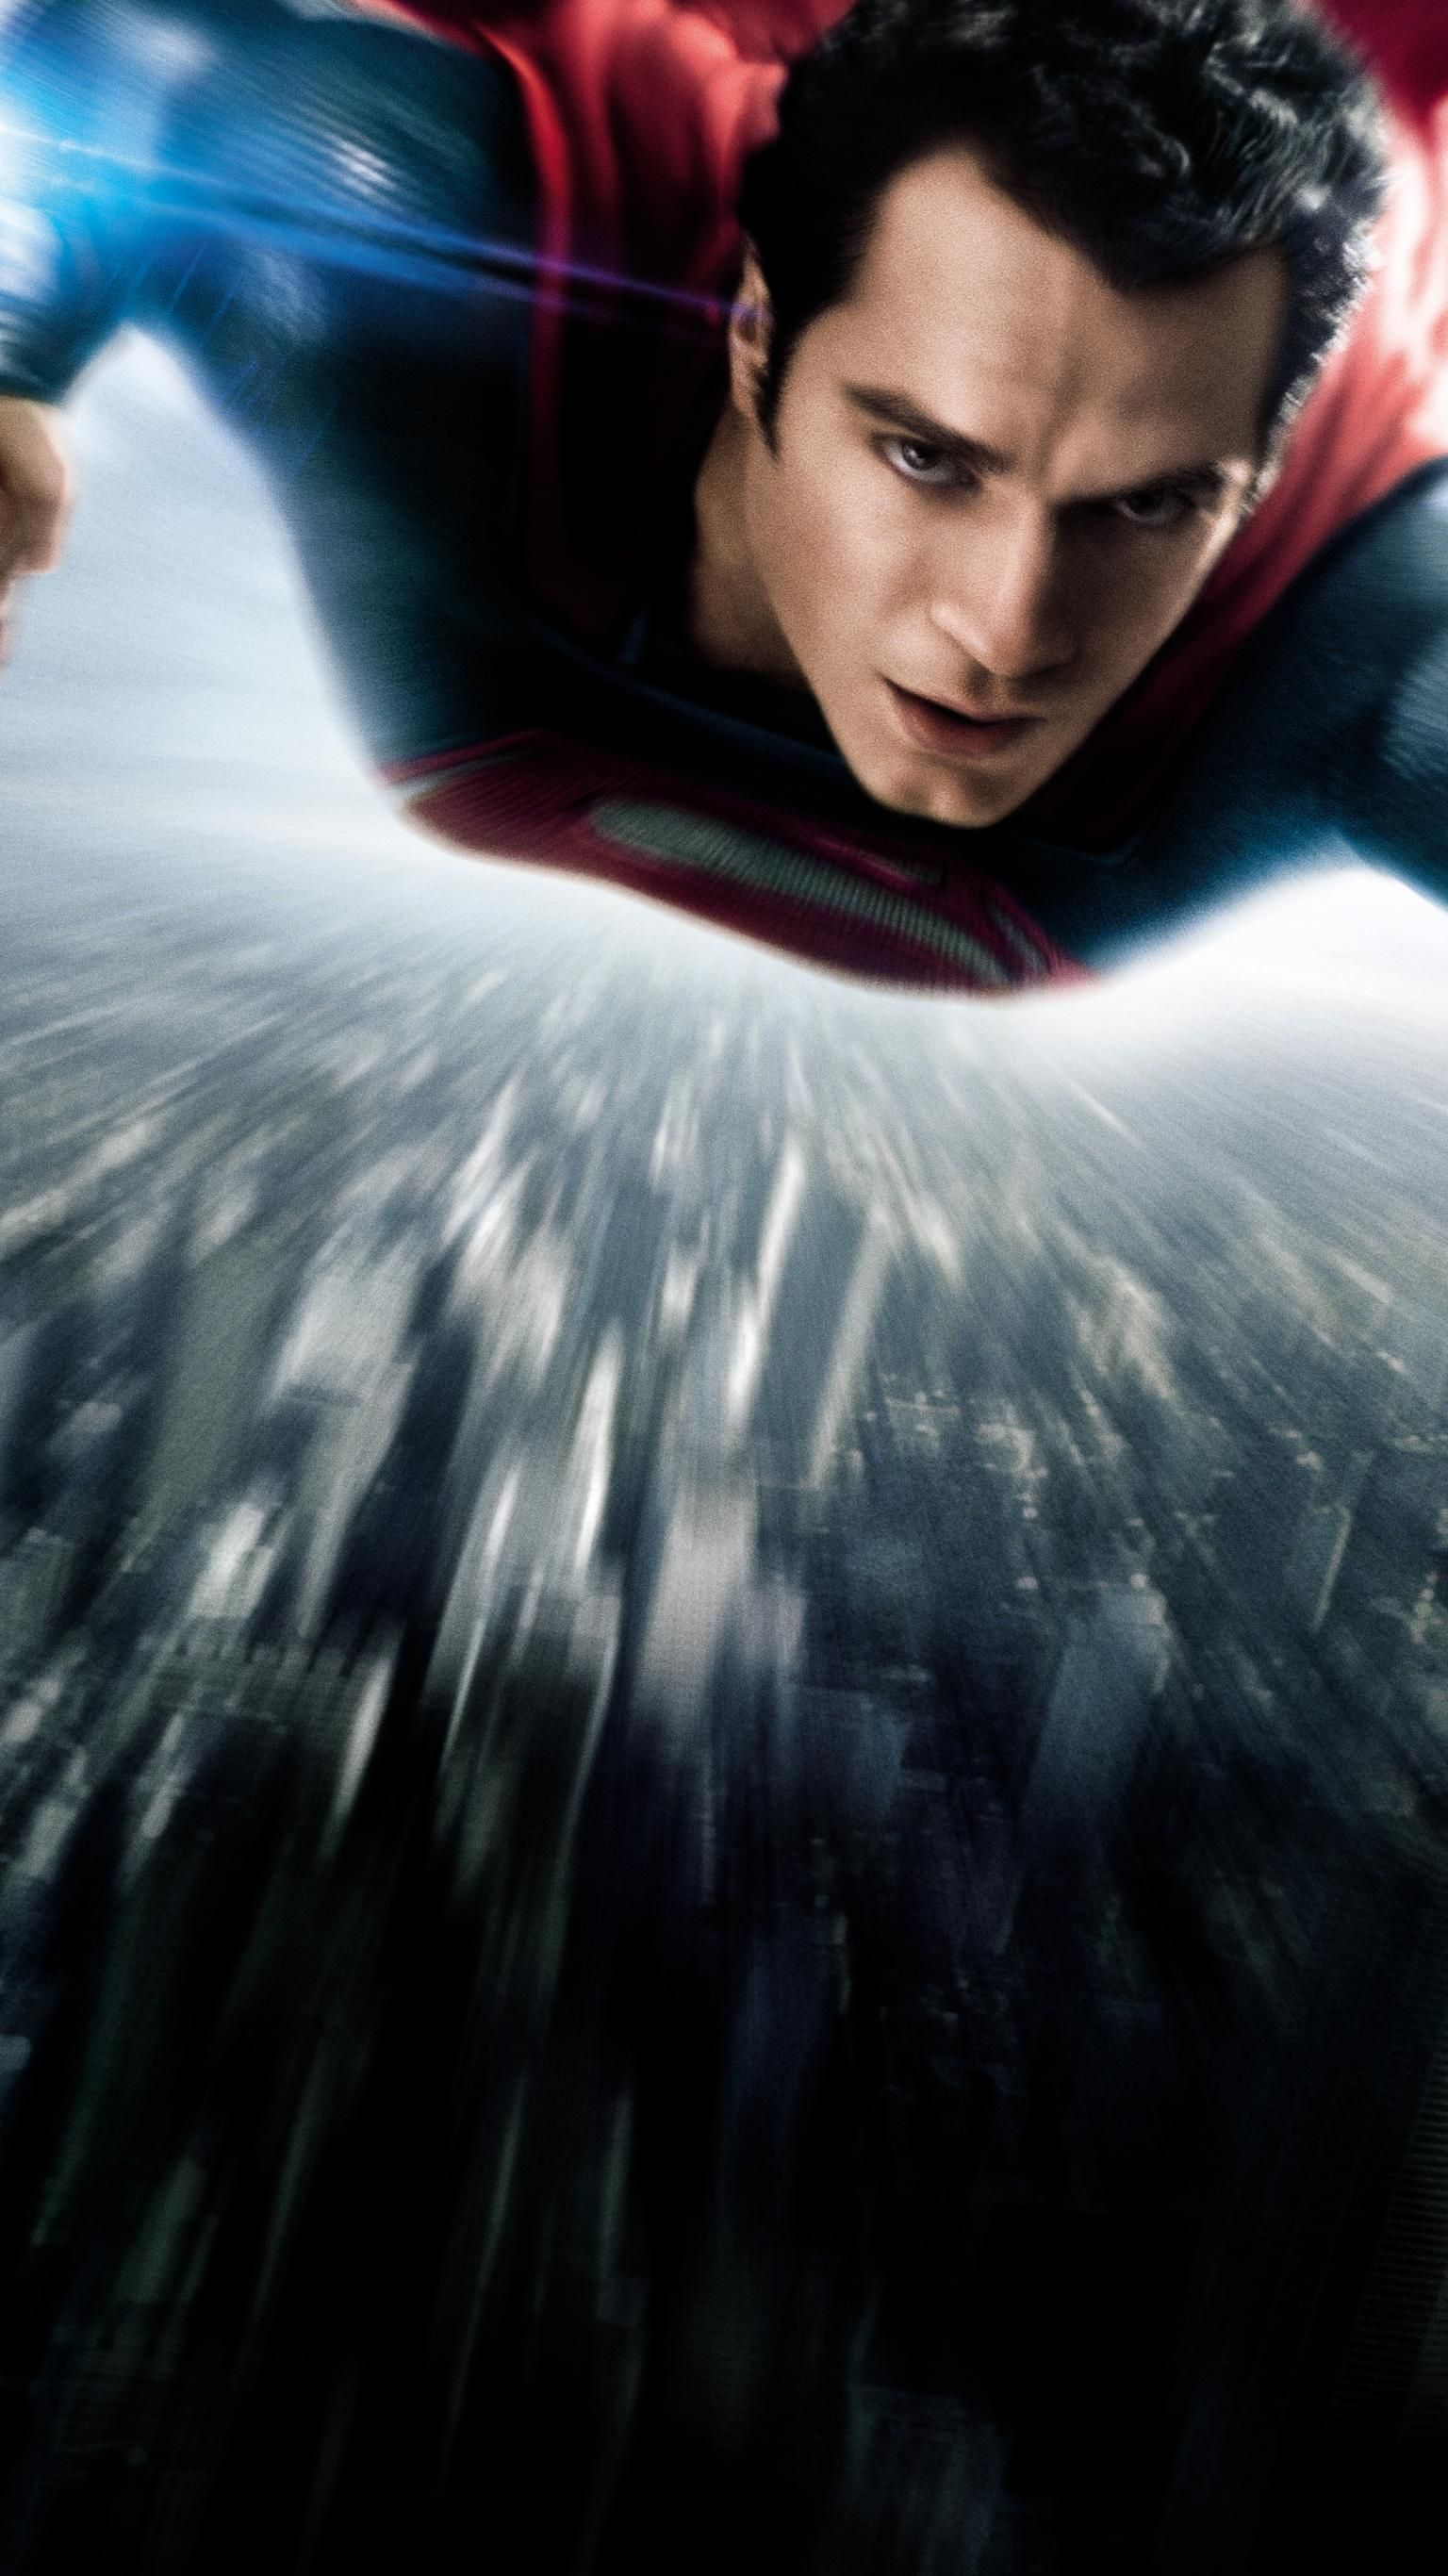 Man Of Steel 2013 Phone Wallpaper Moviemania Man Of Steel Film Man Of Steel Superman Man Of Steel